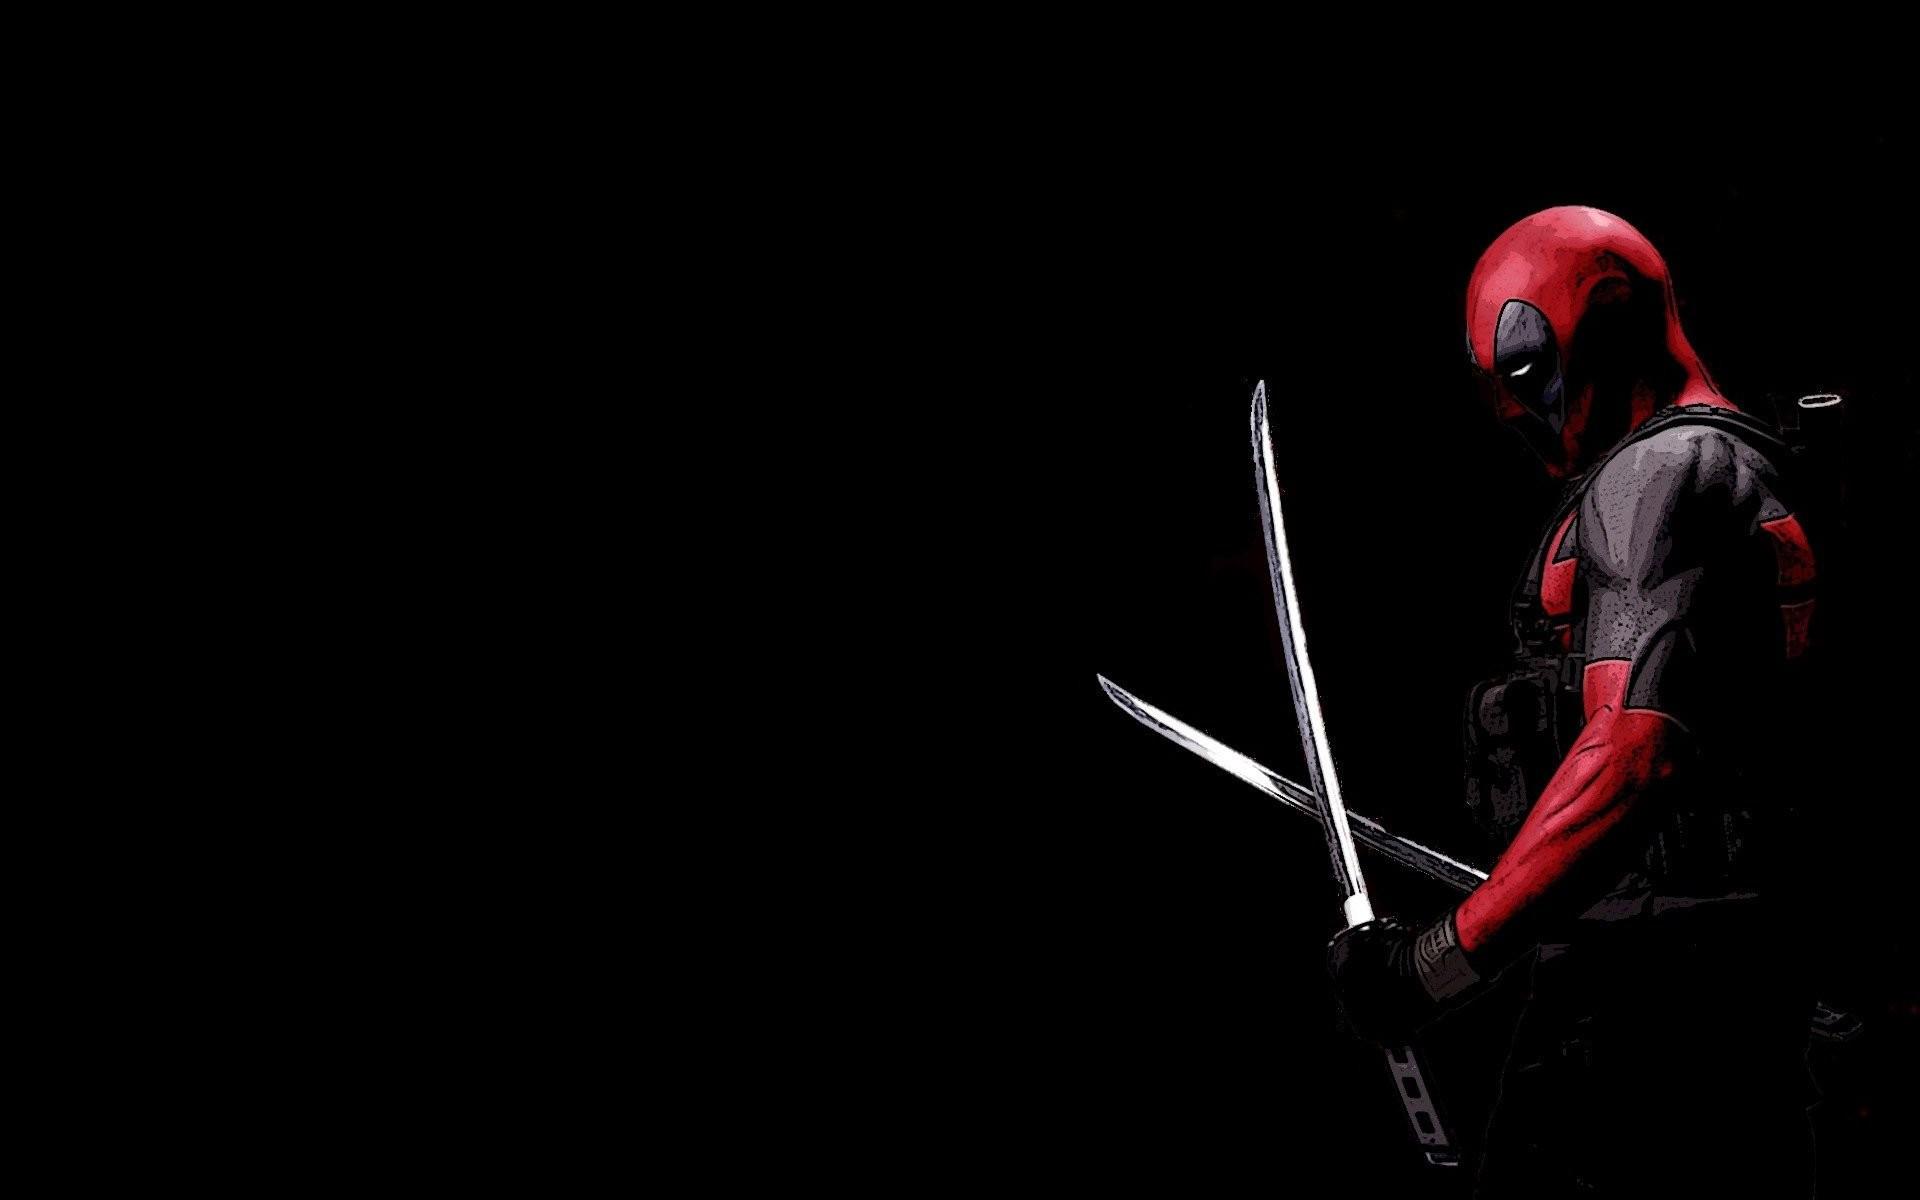 Deadpool Wallpaper 1080p (73+ Images